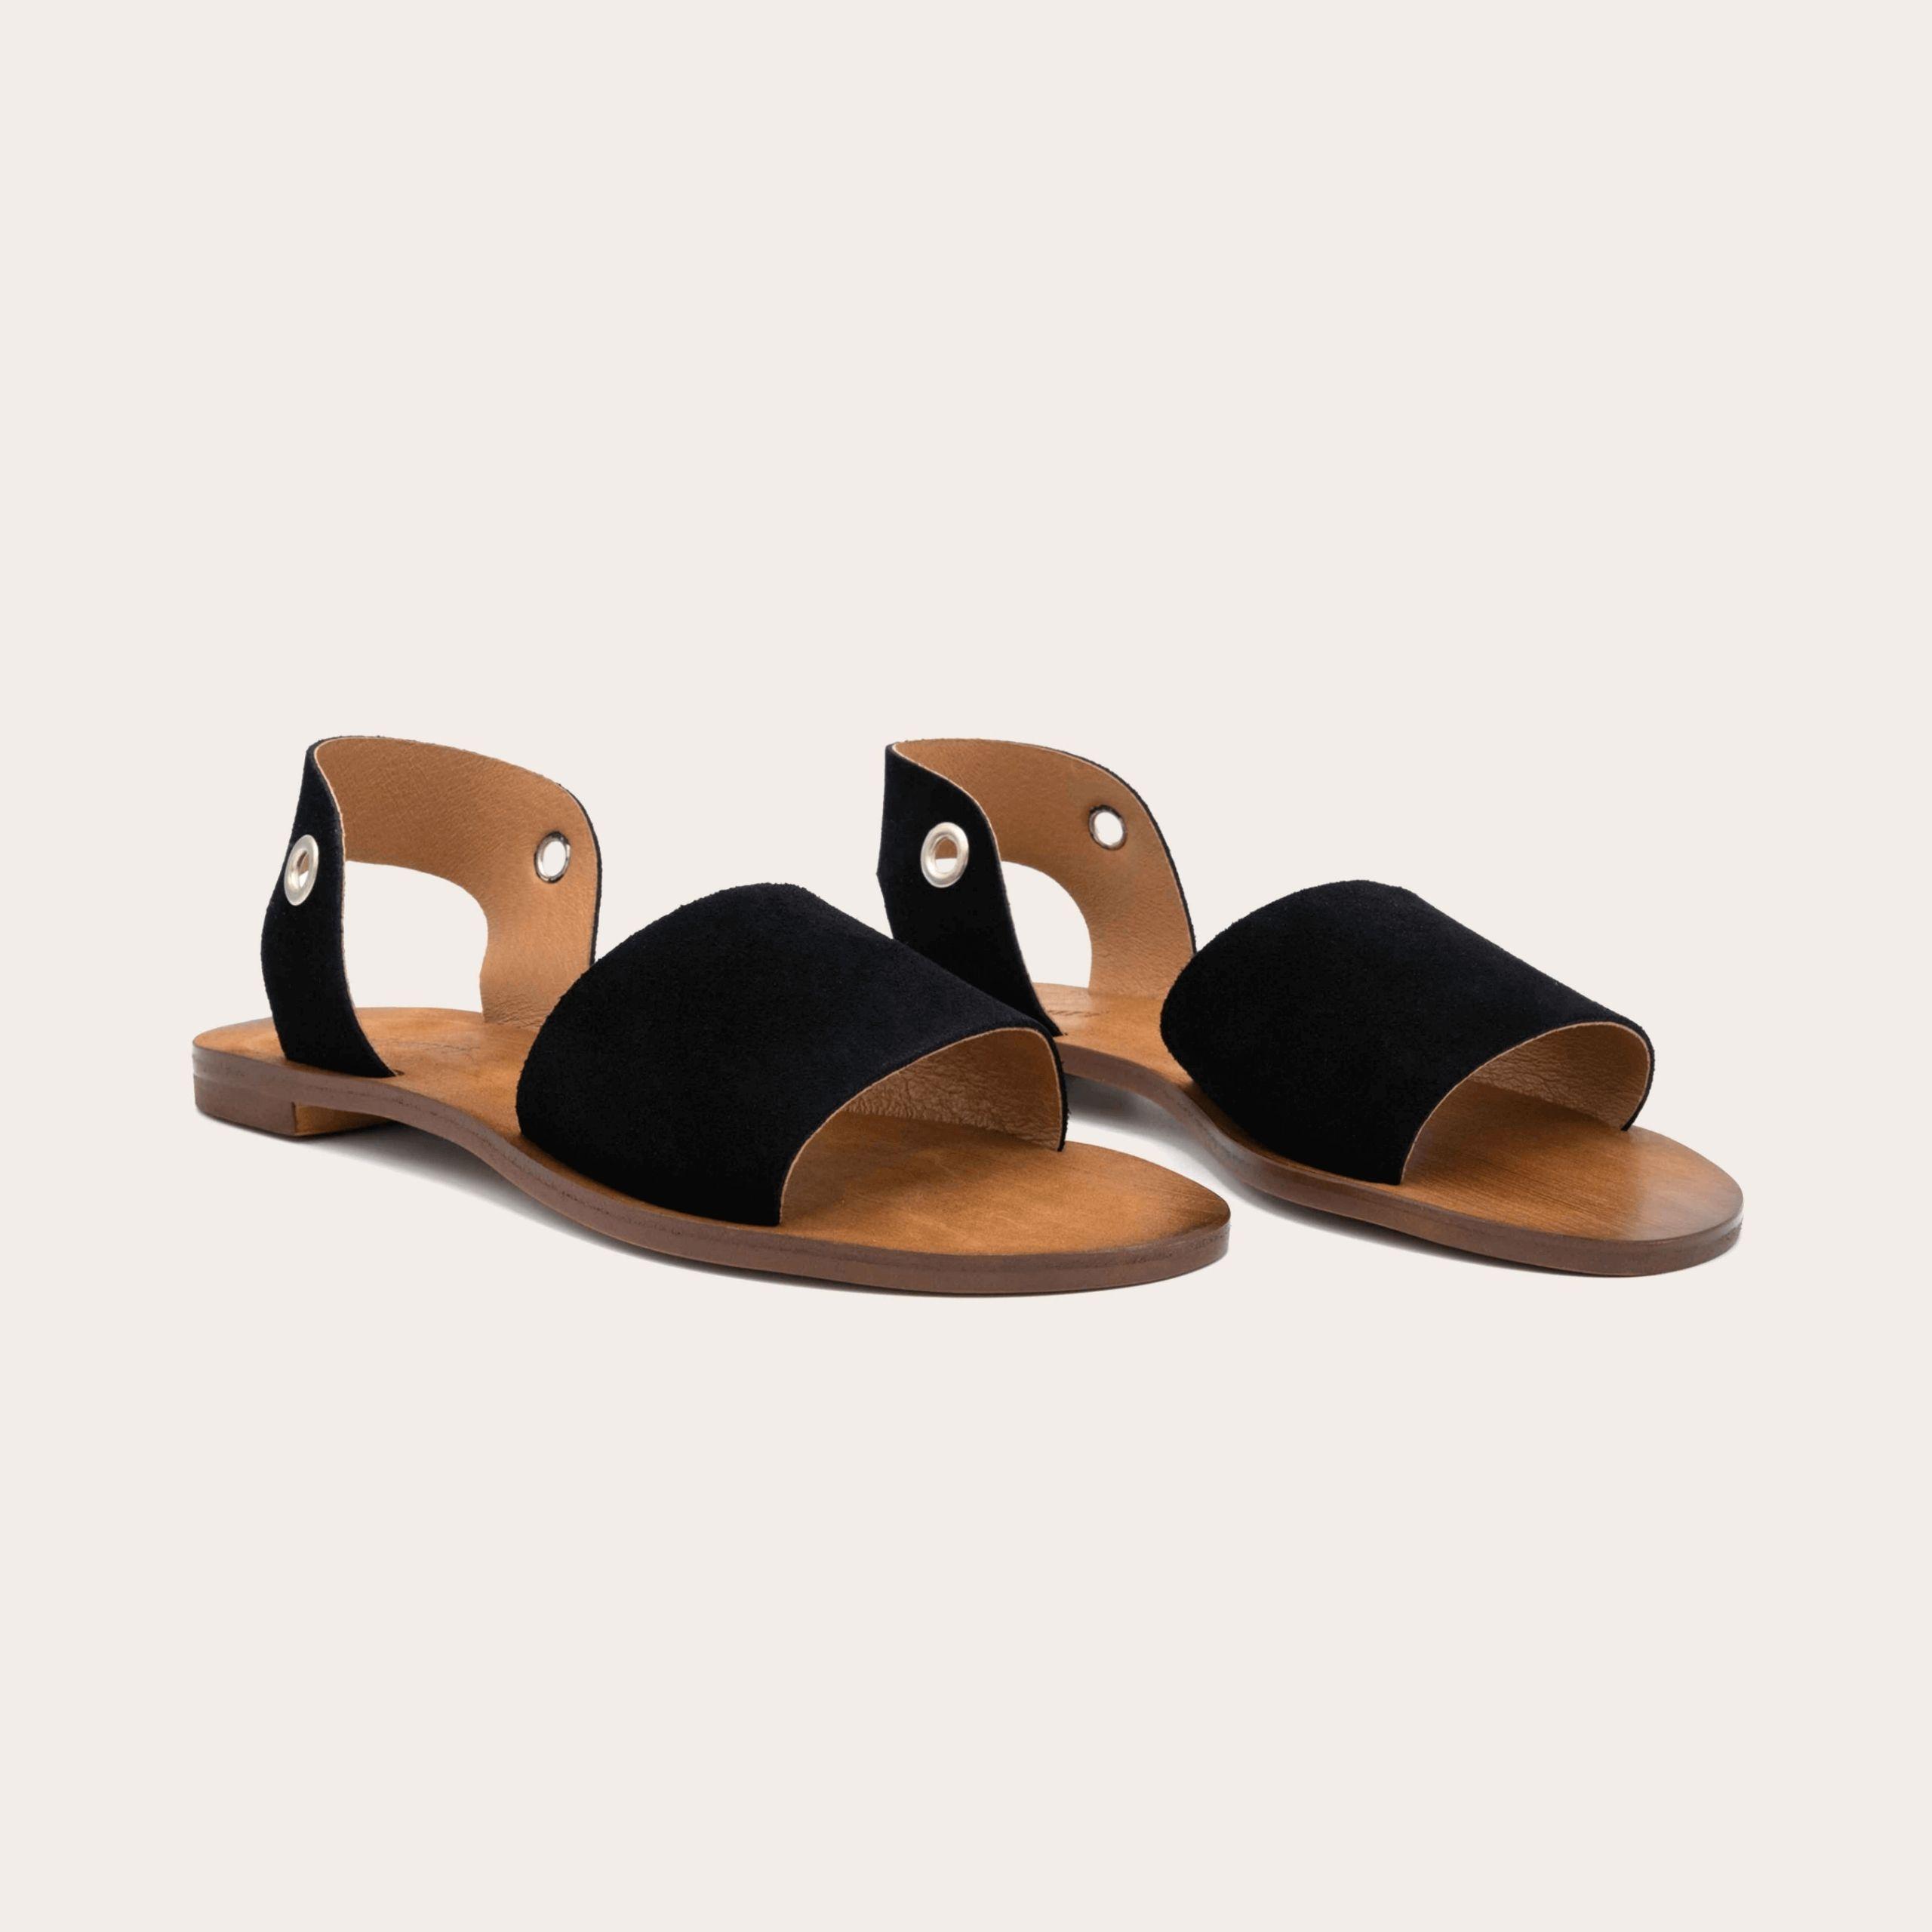 acapulco-black_2_lintsandalen sandals travelsandals vegan sustainable sandals wikkelsandalen